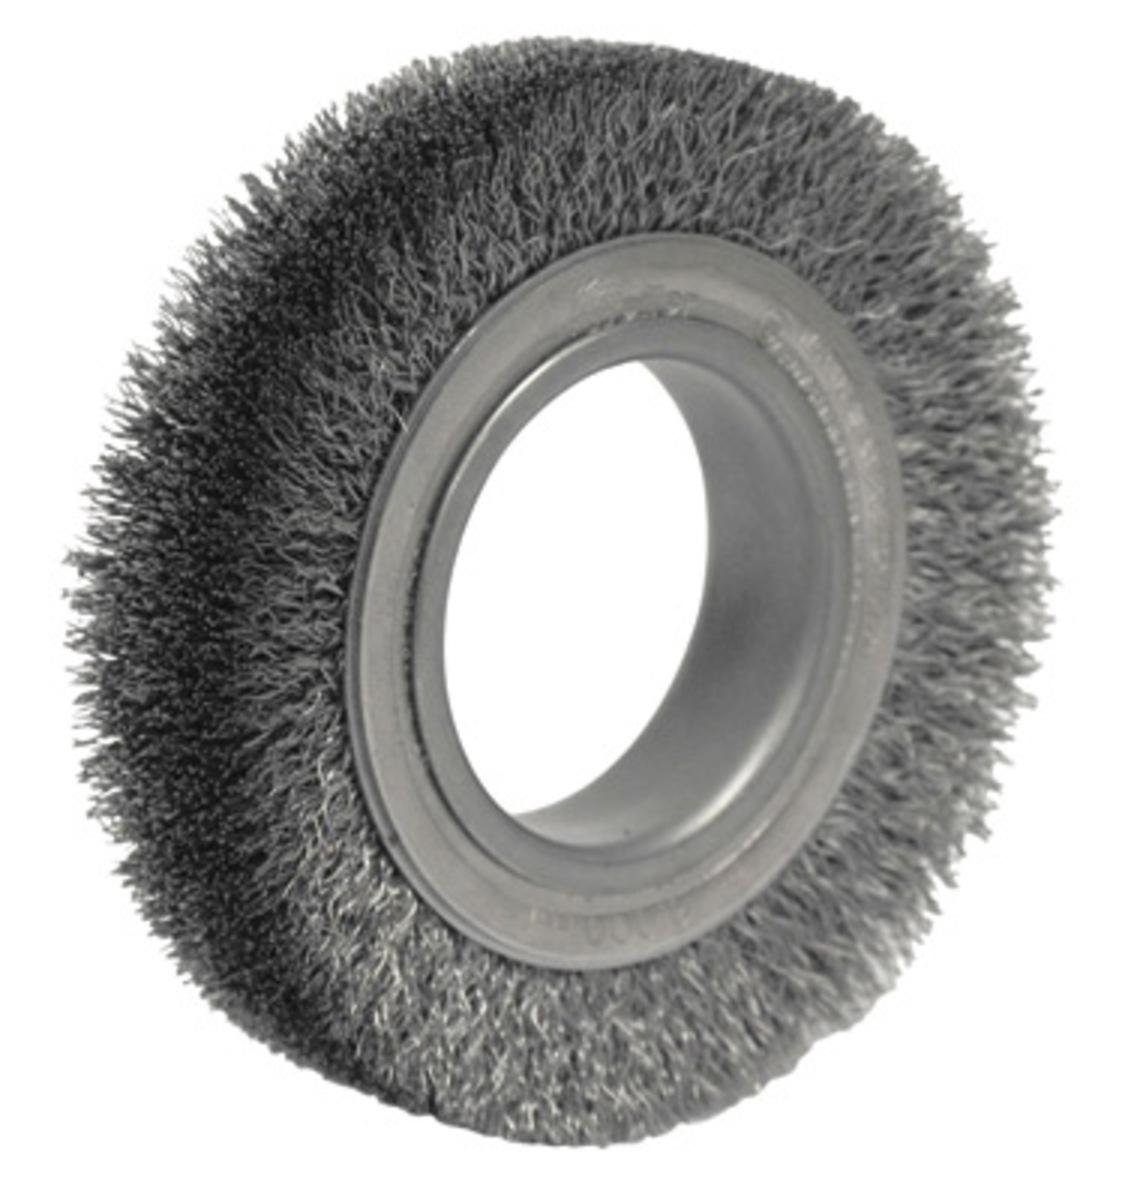 Medium Carbon Steel Wire : Airgas wbu weiler quot trulock™ carbon